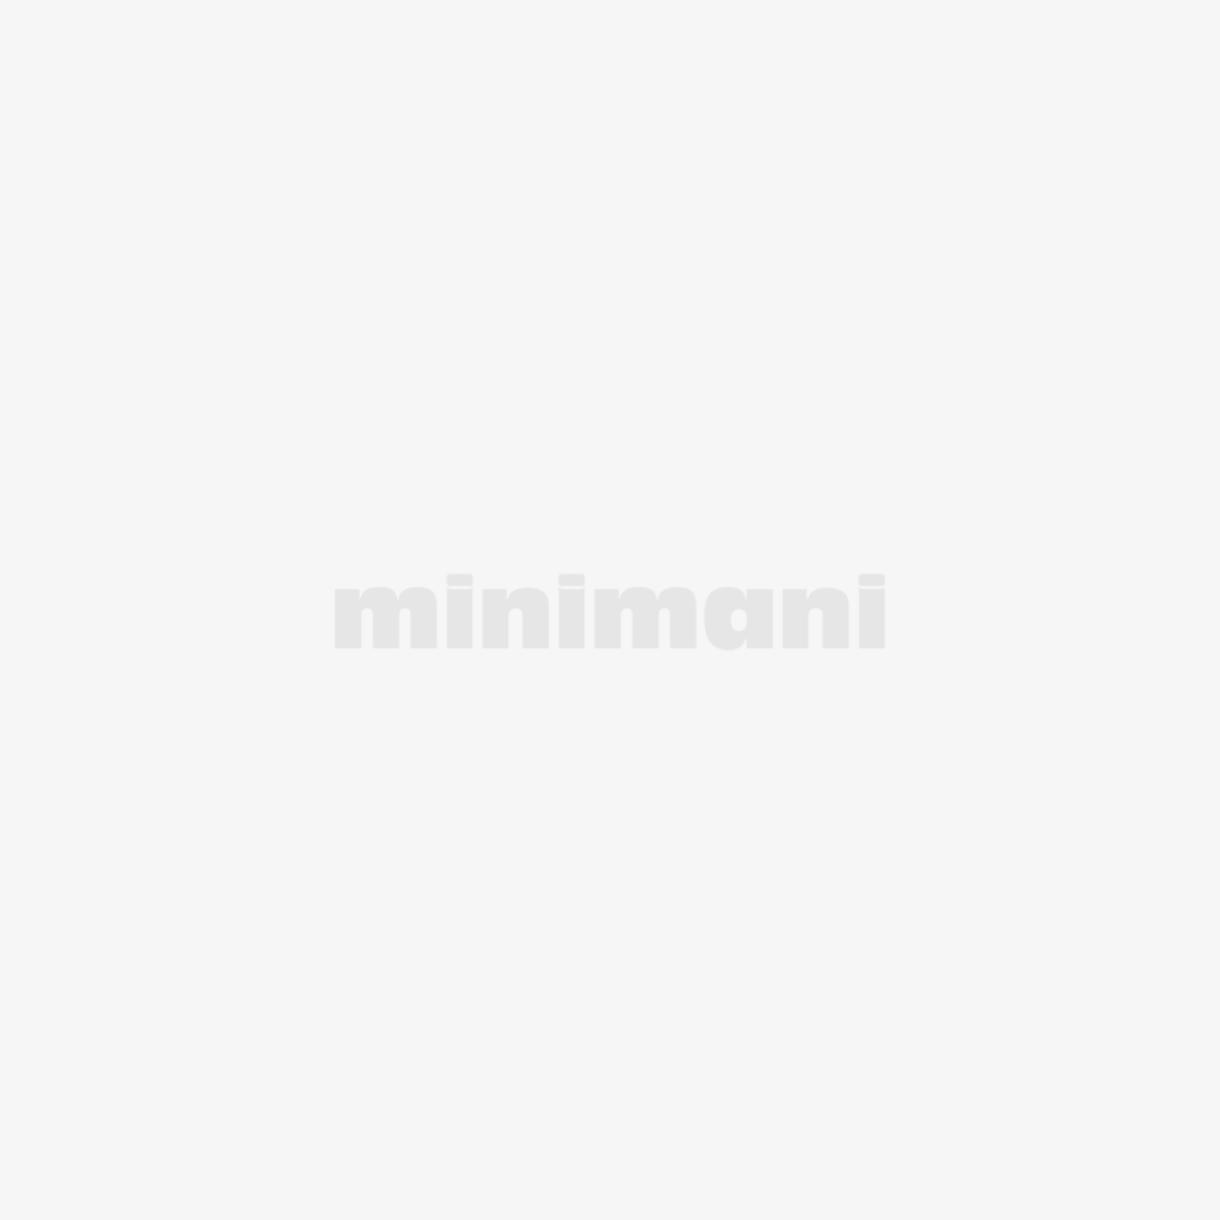 AIV M8 25M2 RENGASLIITIN 2 KPL